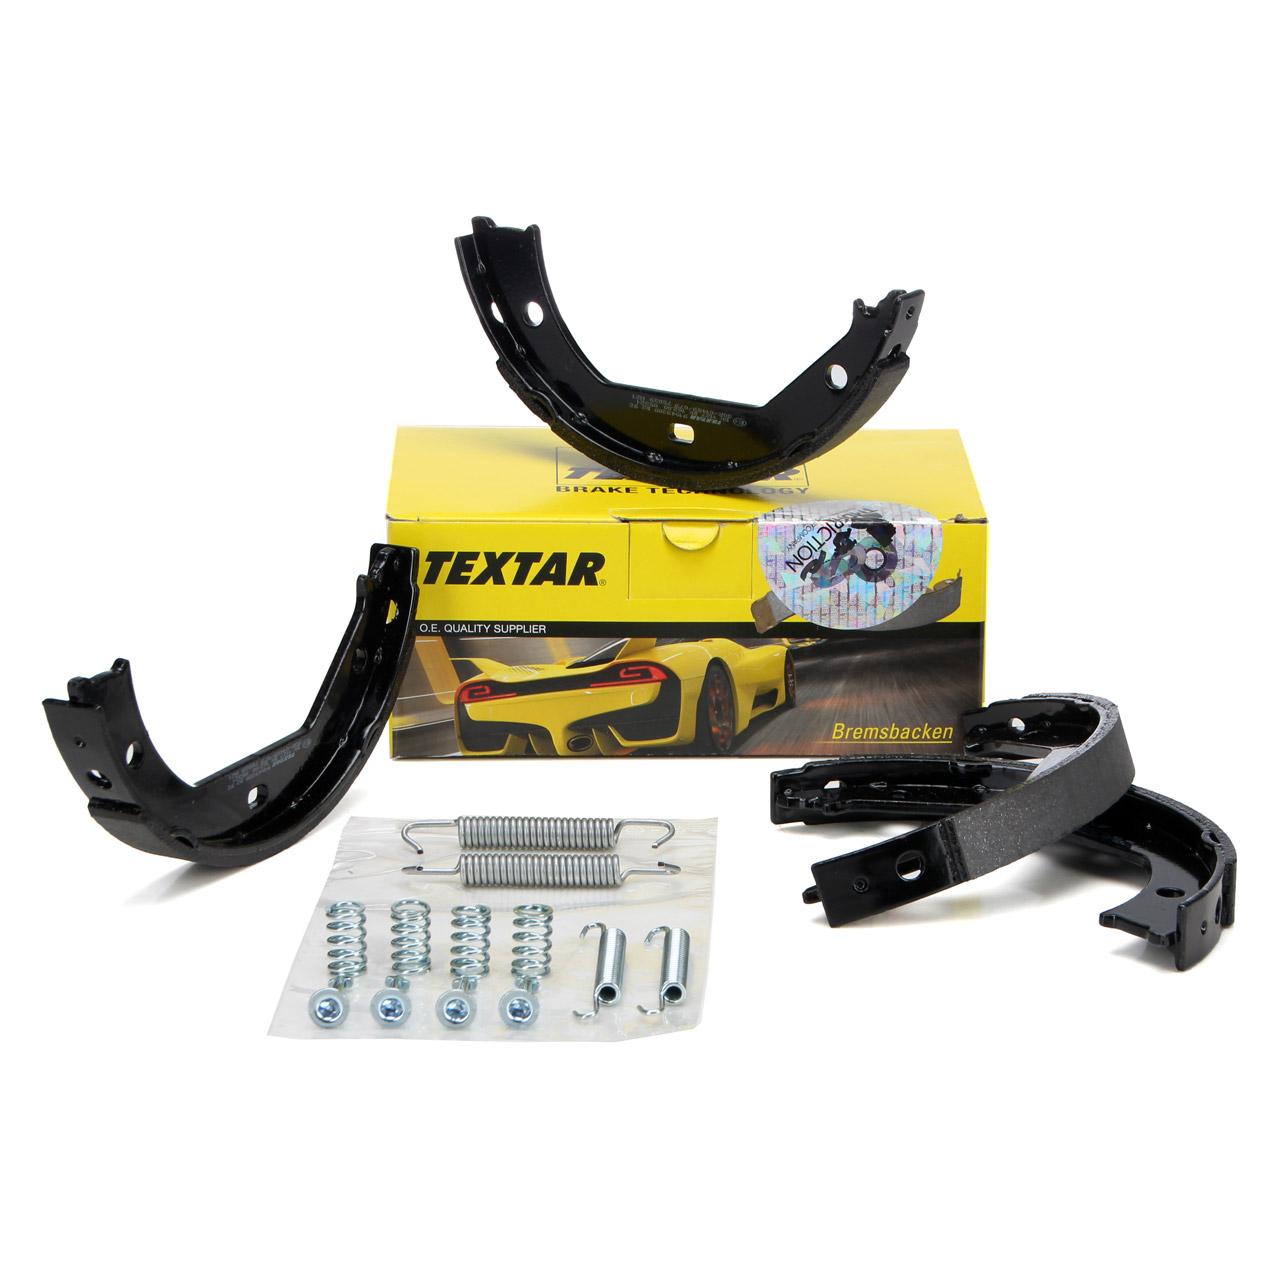 TEXTAR 91049300 Bremsbacken + Federn Satz BMW E81-88 E46 E90-93 F30-34 F32-36 E39 X1 E84